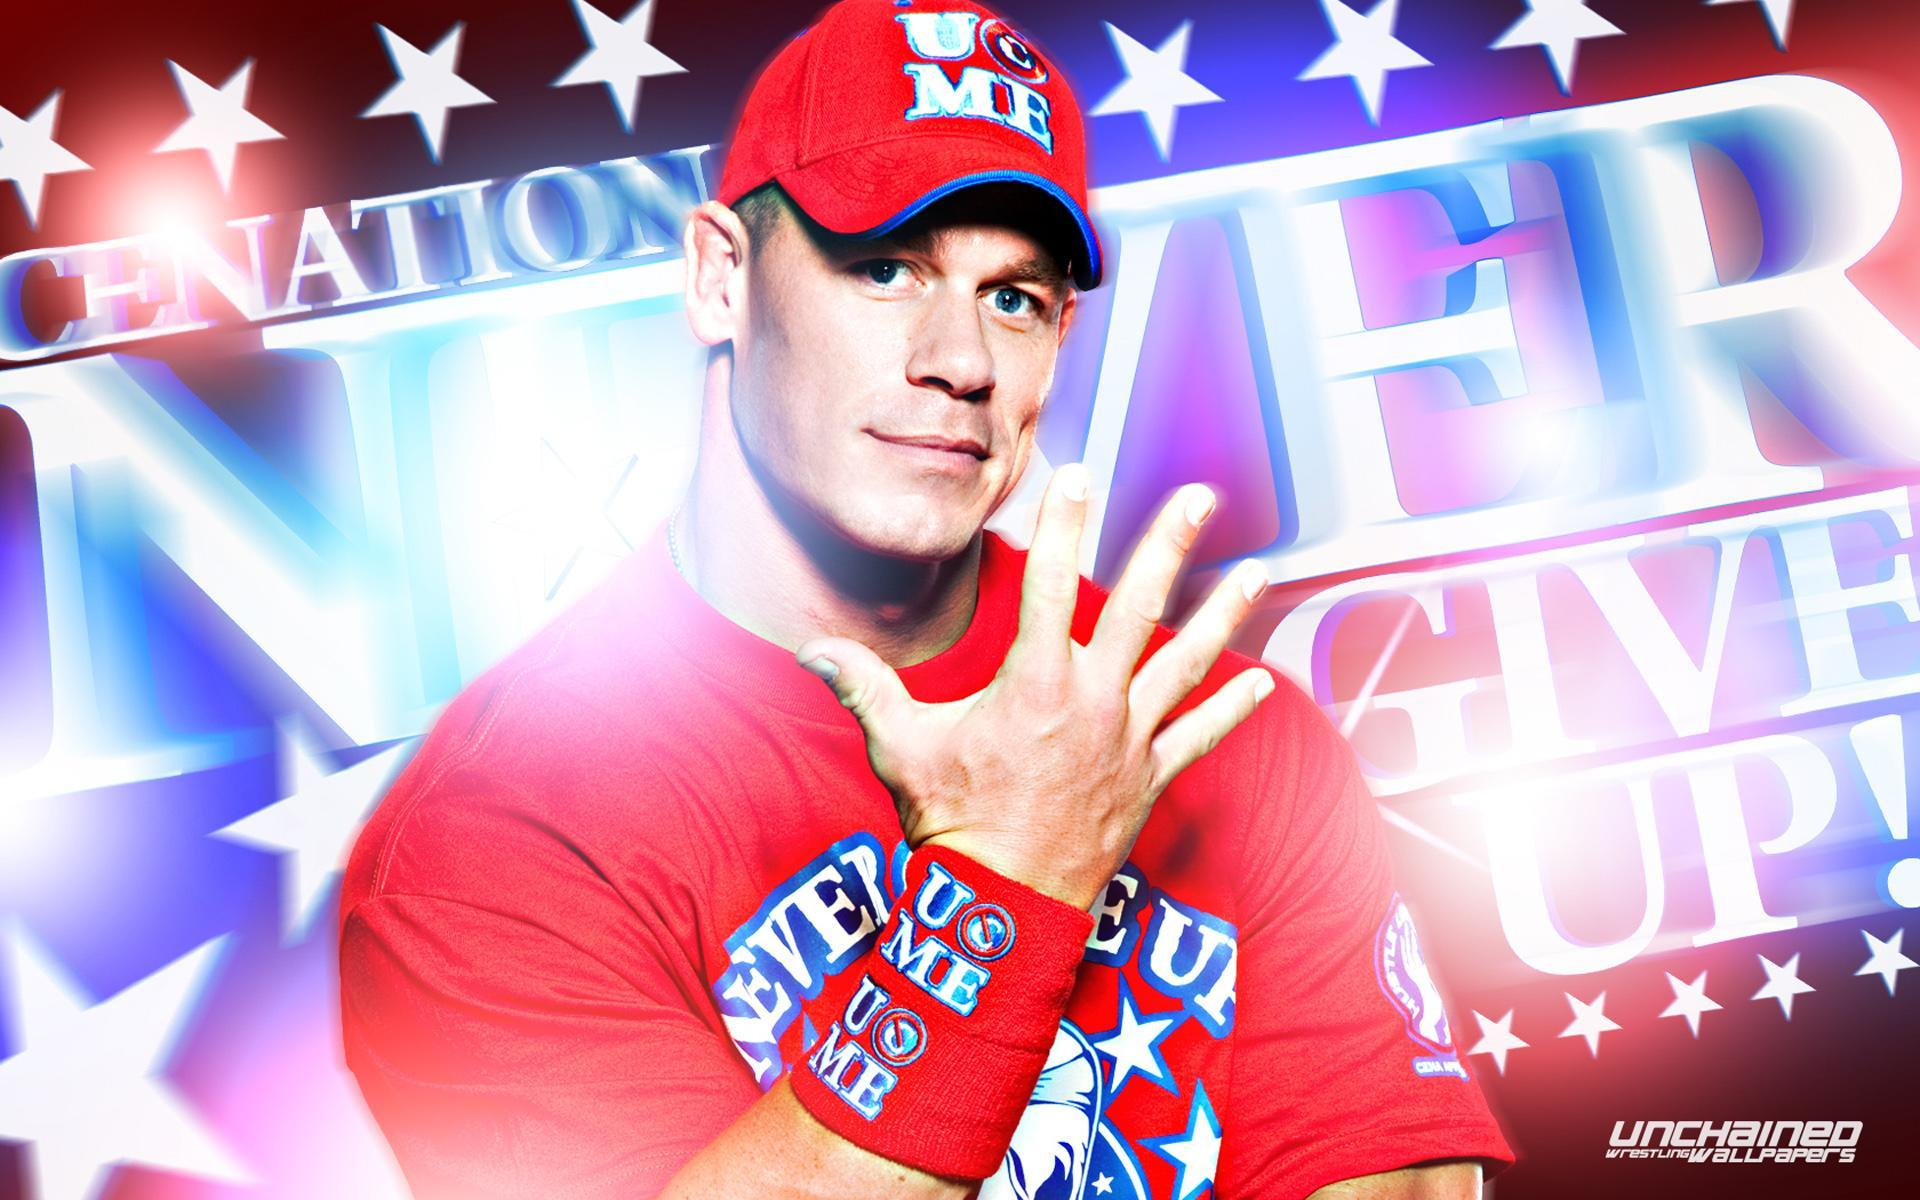 John-Cena-Find-best-latest-John-Cena-for-your-PC-desktop-background-mobile-pho-wallpaper-wp3407620